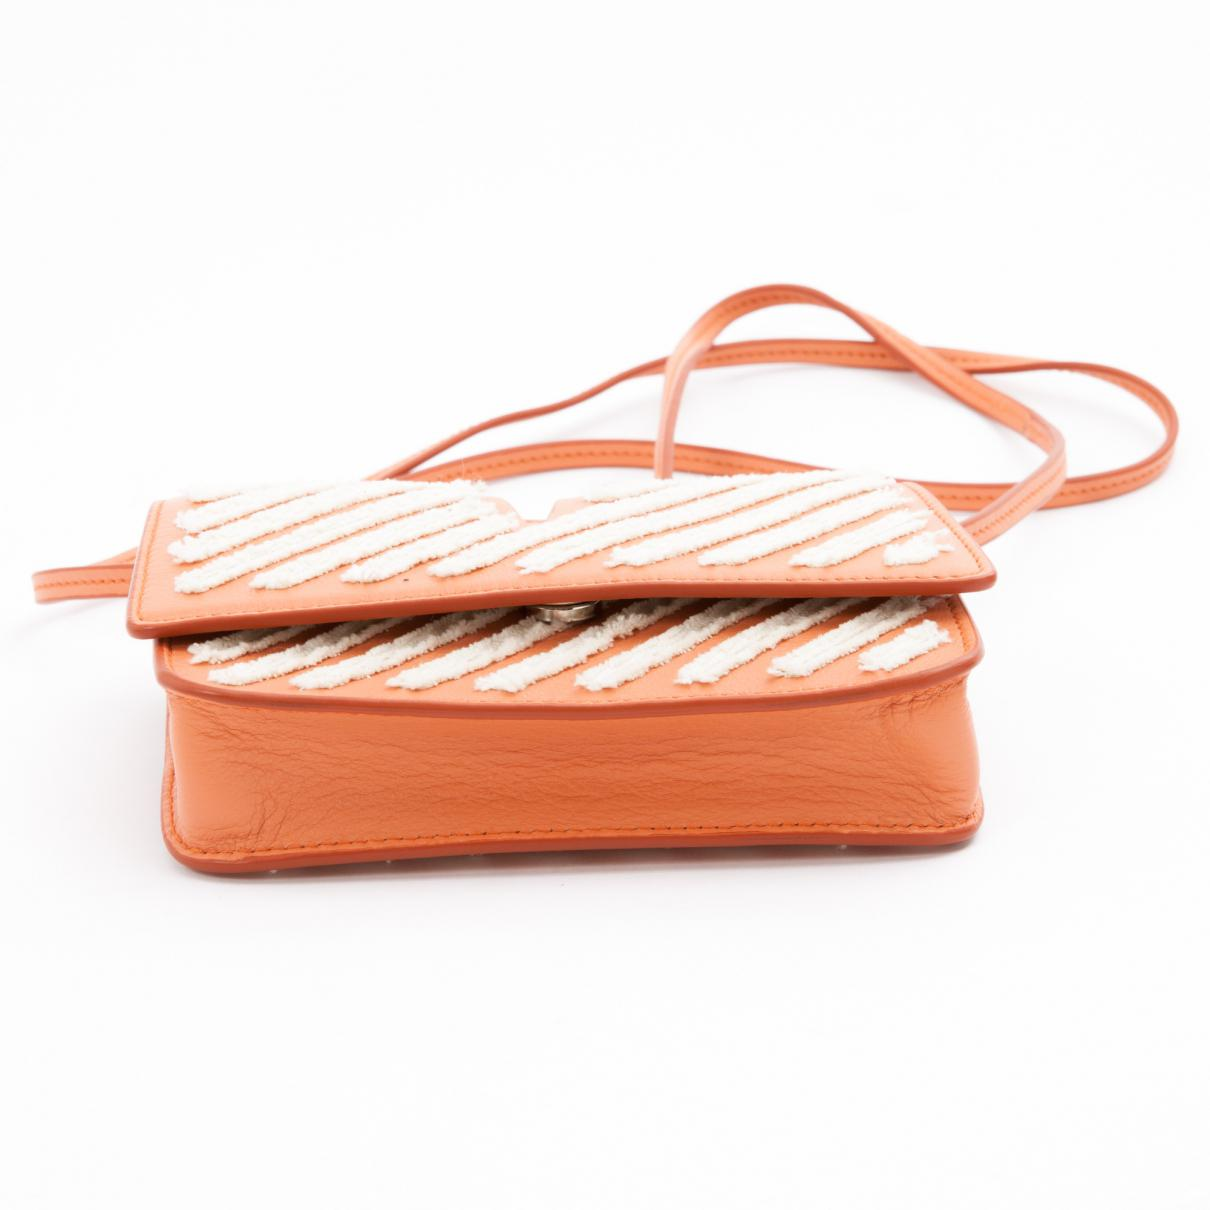 Jil Sander Pre-owned - Leather mini bag DtwbChyM